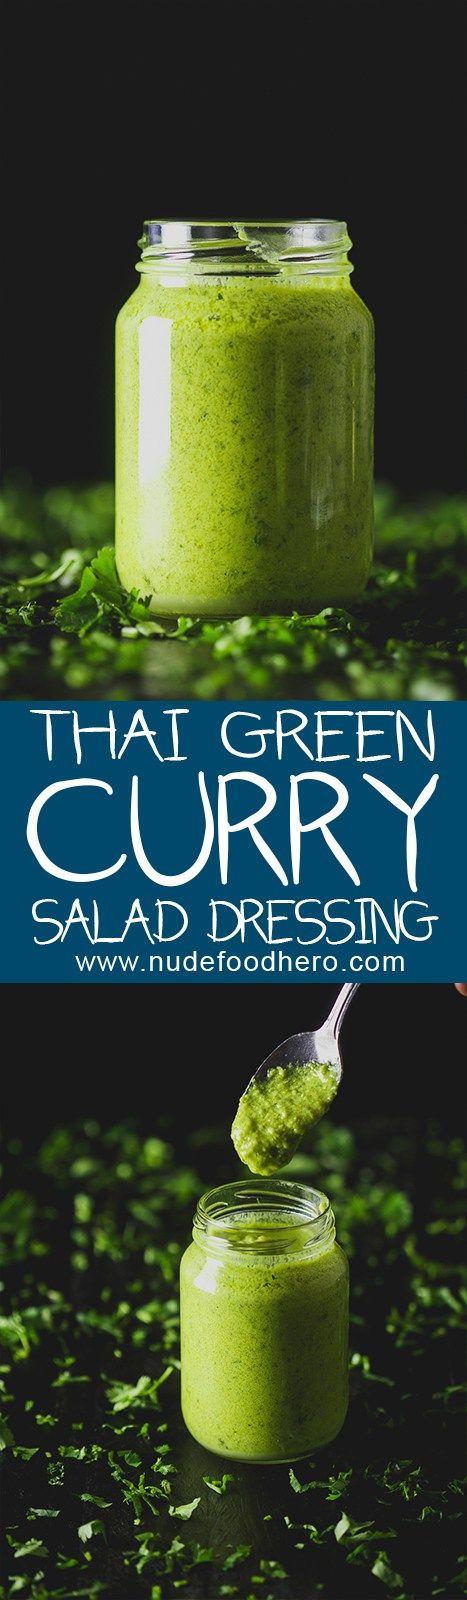 Thai Green-Curry Salad Dressing